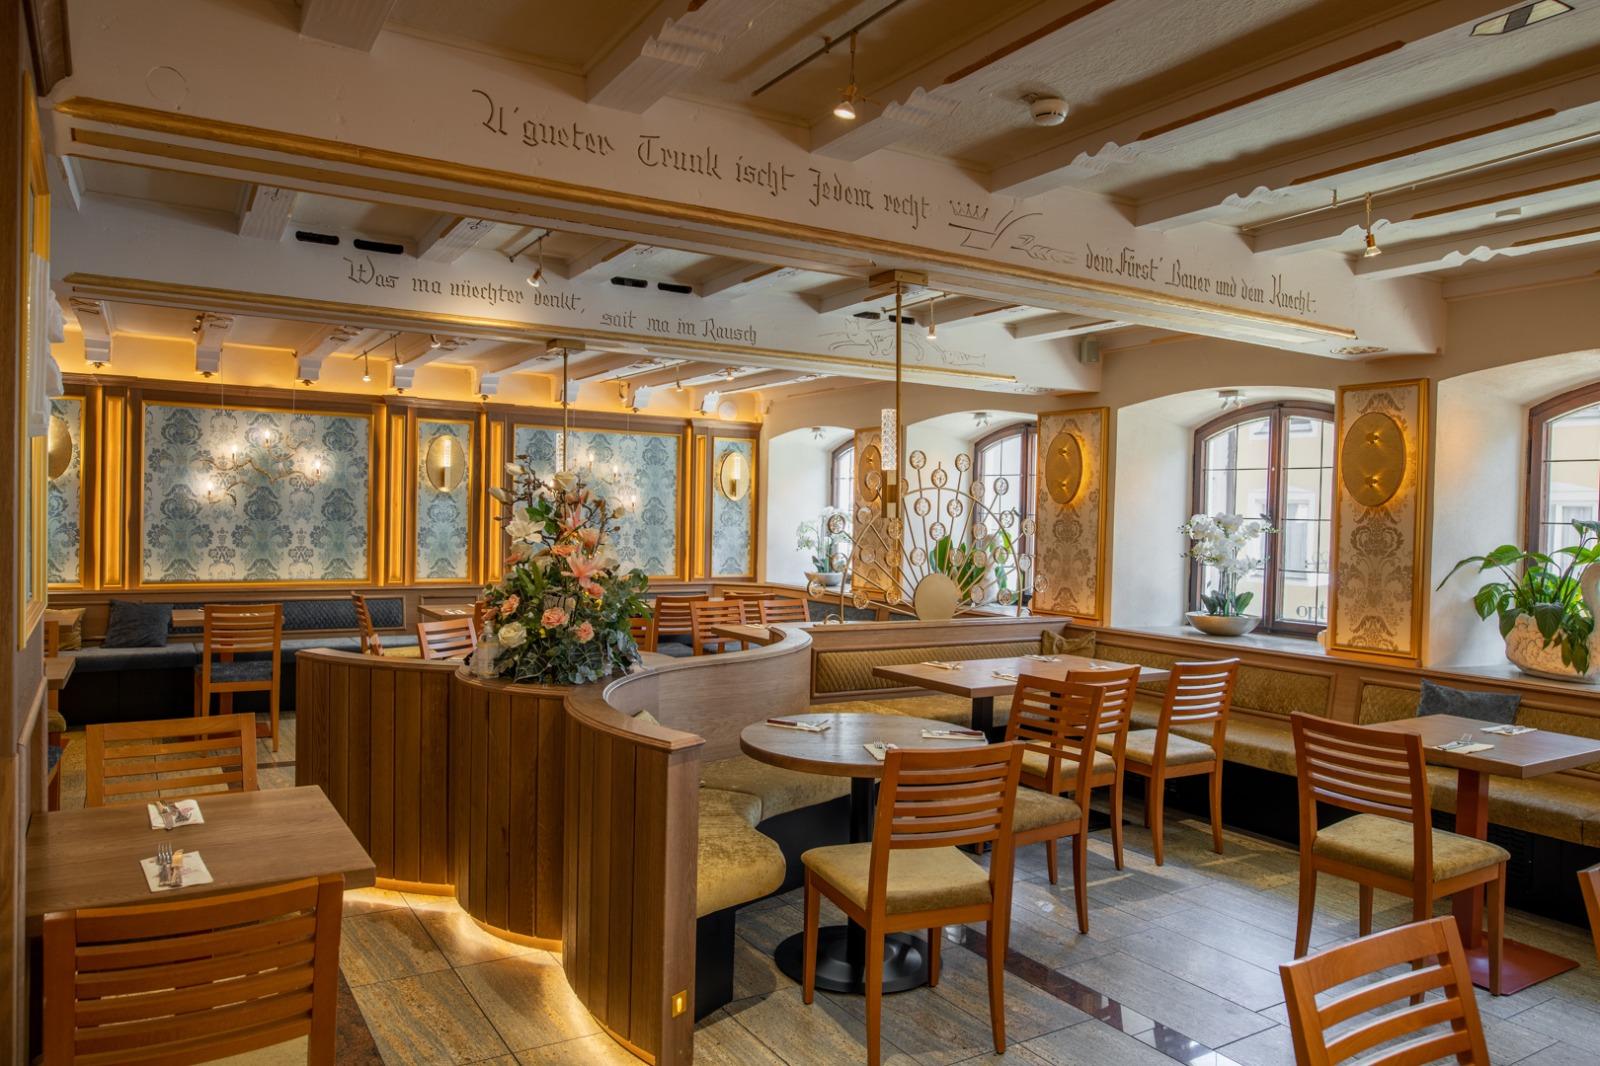 Hotel Ludwigs Restaurant